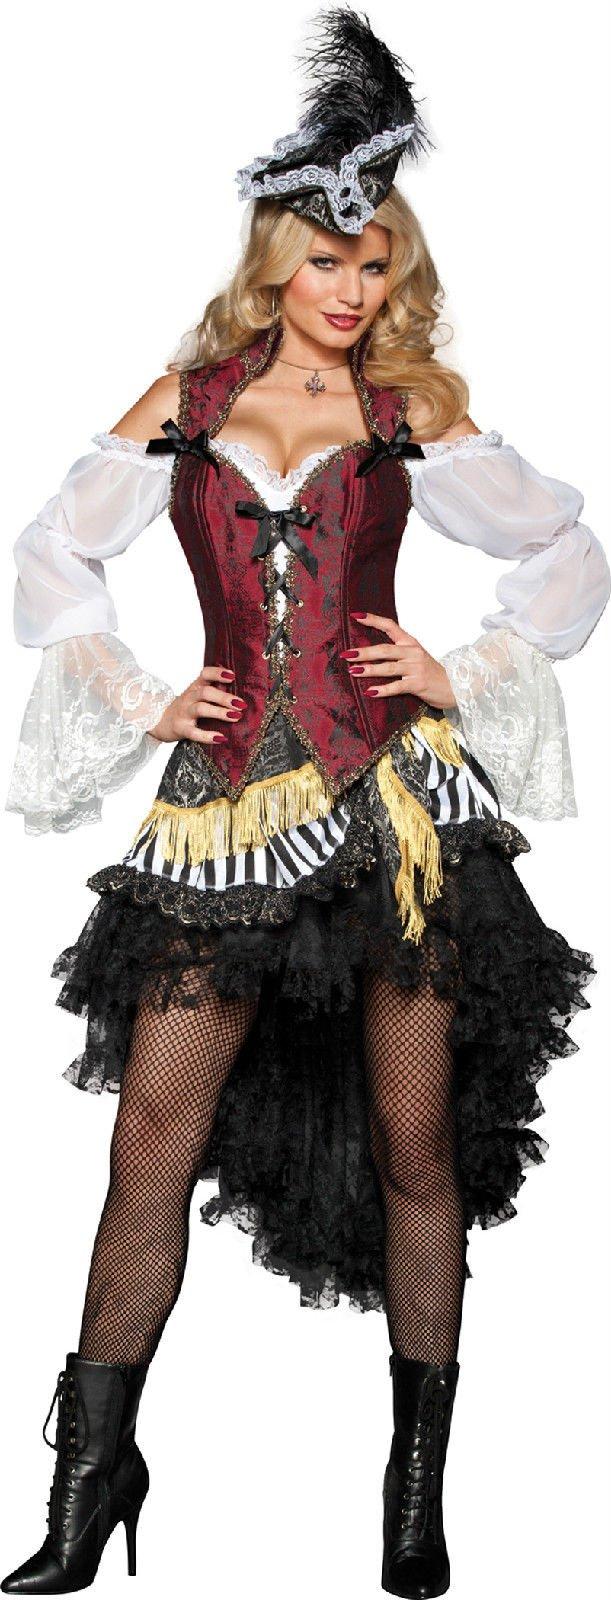 InCharacter Costumes Women's High Seas Treasure Pirate Costume, Black/Red/White, Small